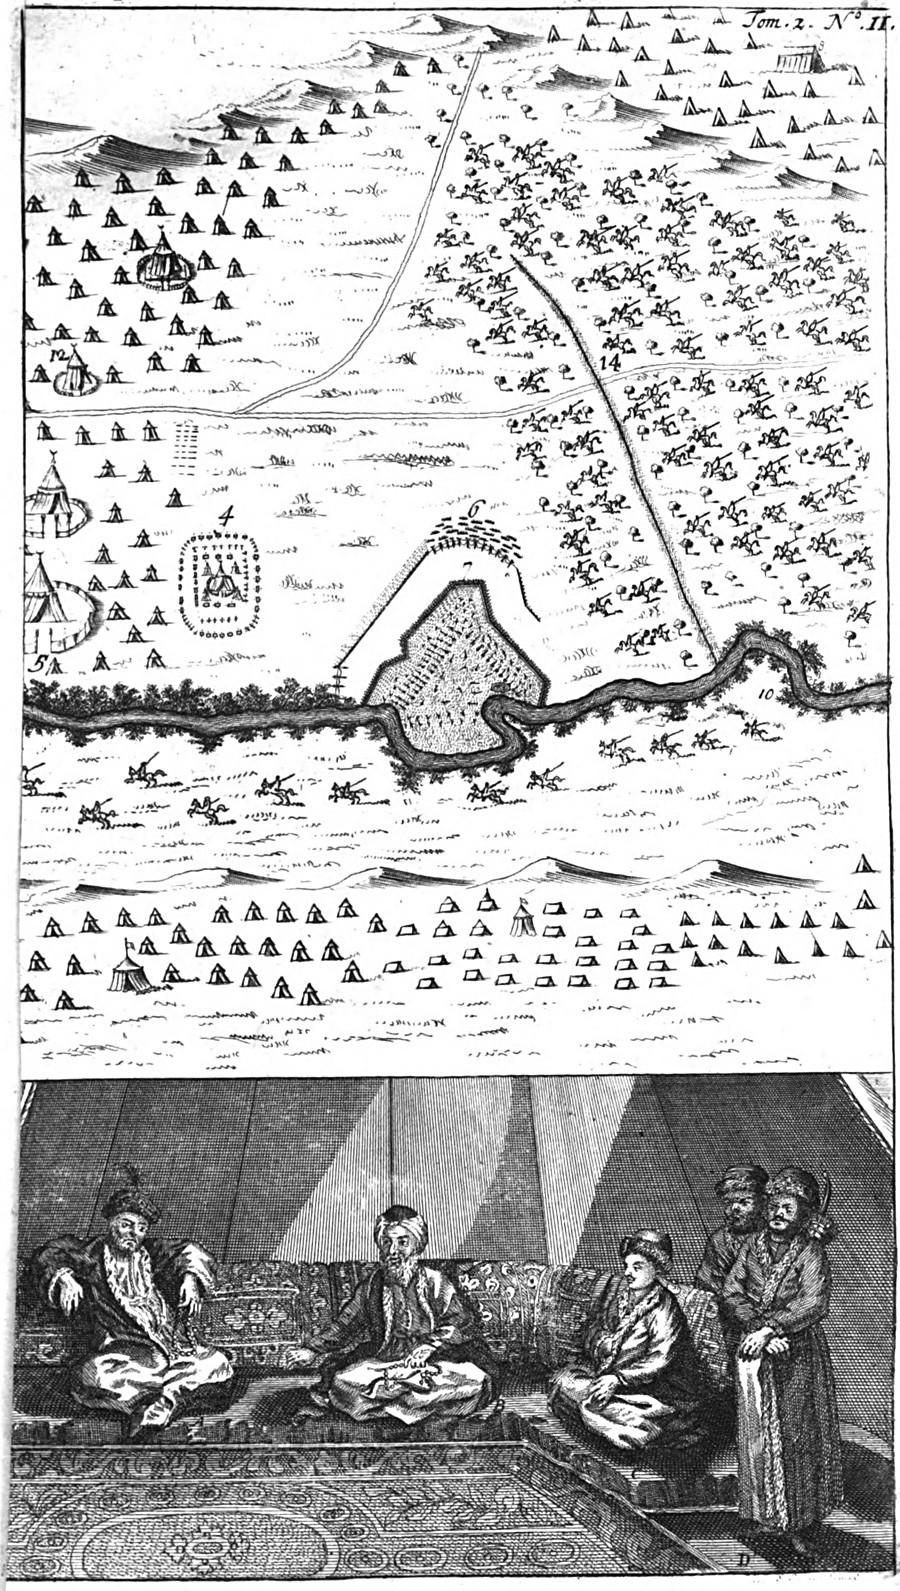 Bataille du Prout. Ilustrasi dari William Hogarth (1697 – 1764) untuk 'Travels' oleh Aubry de la Motraye, 1724.